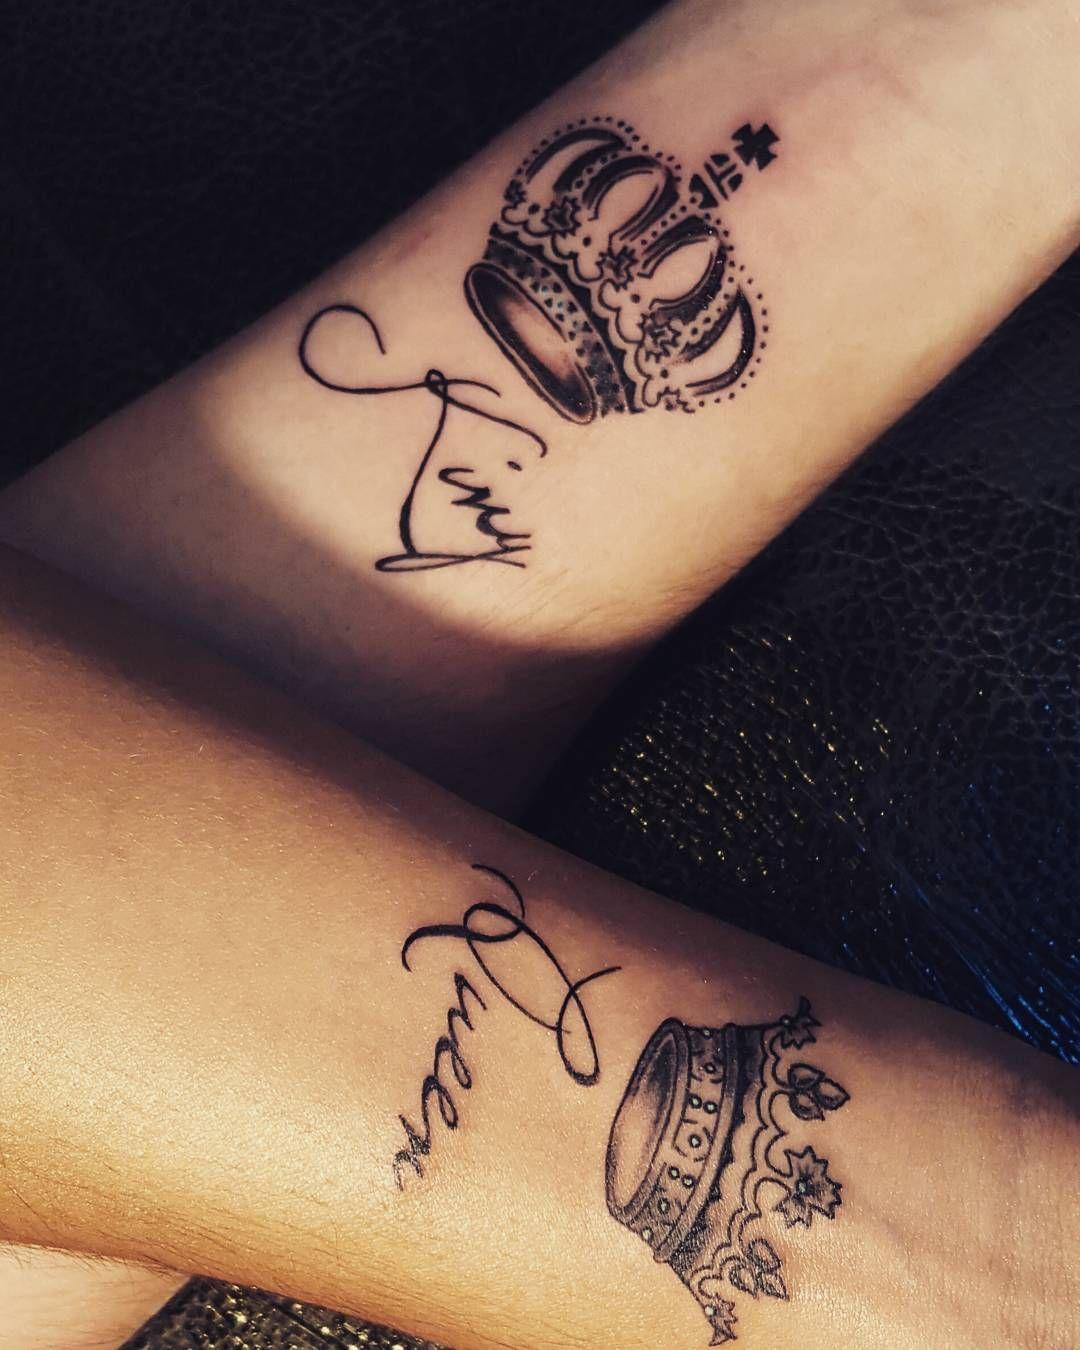 Pin by Amalia on Tattoos Pinterest Tattoos Crown tattoo design